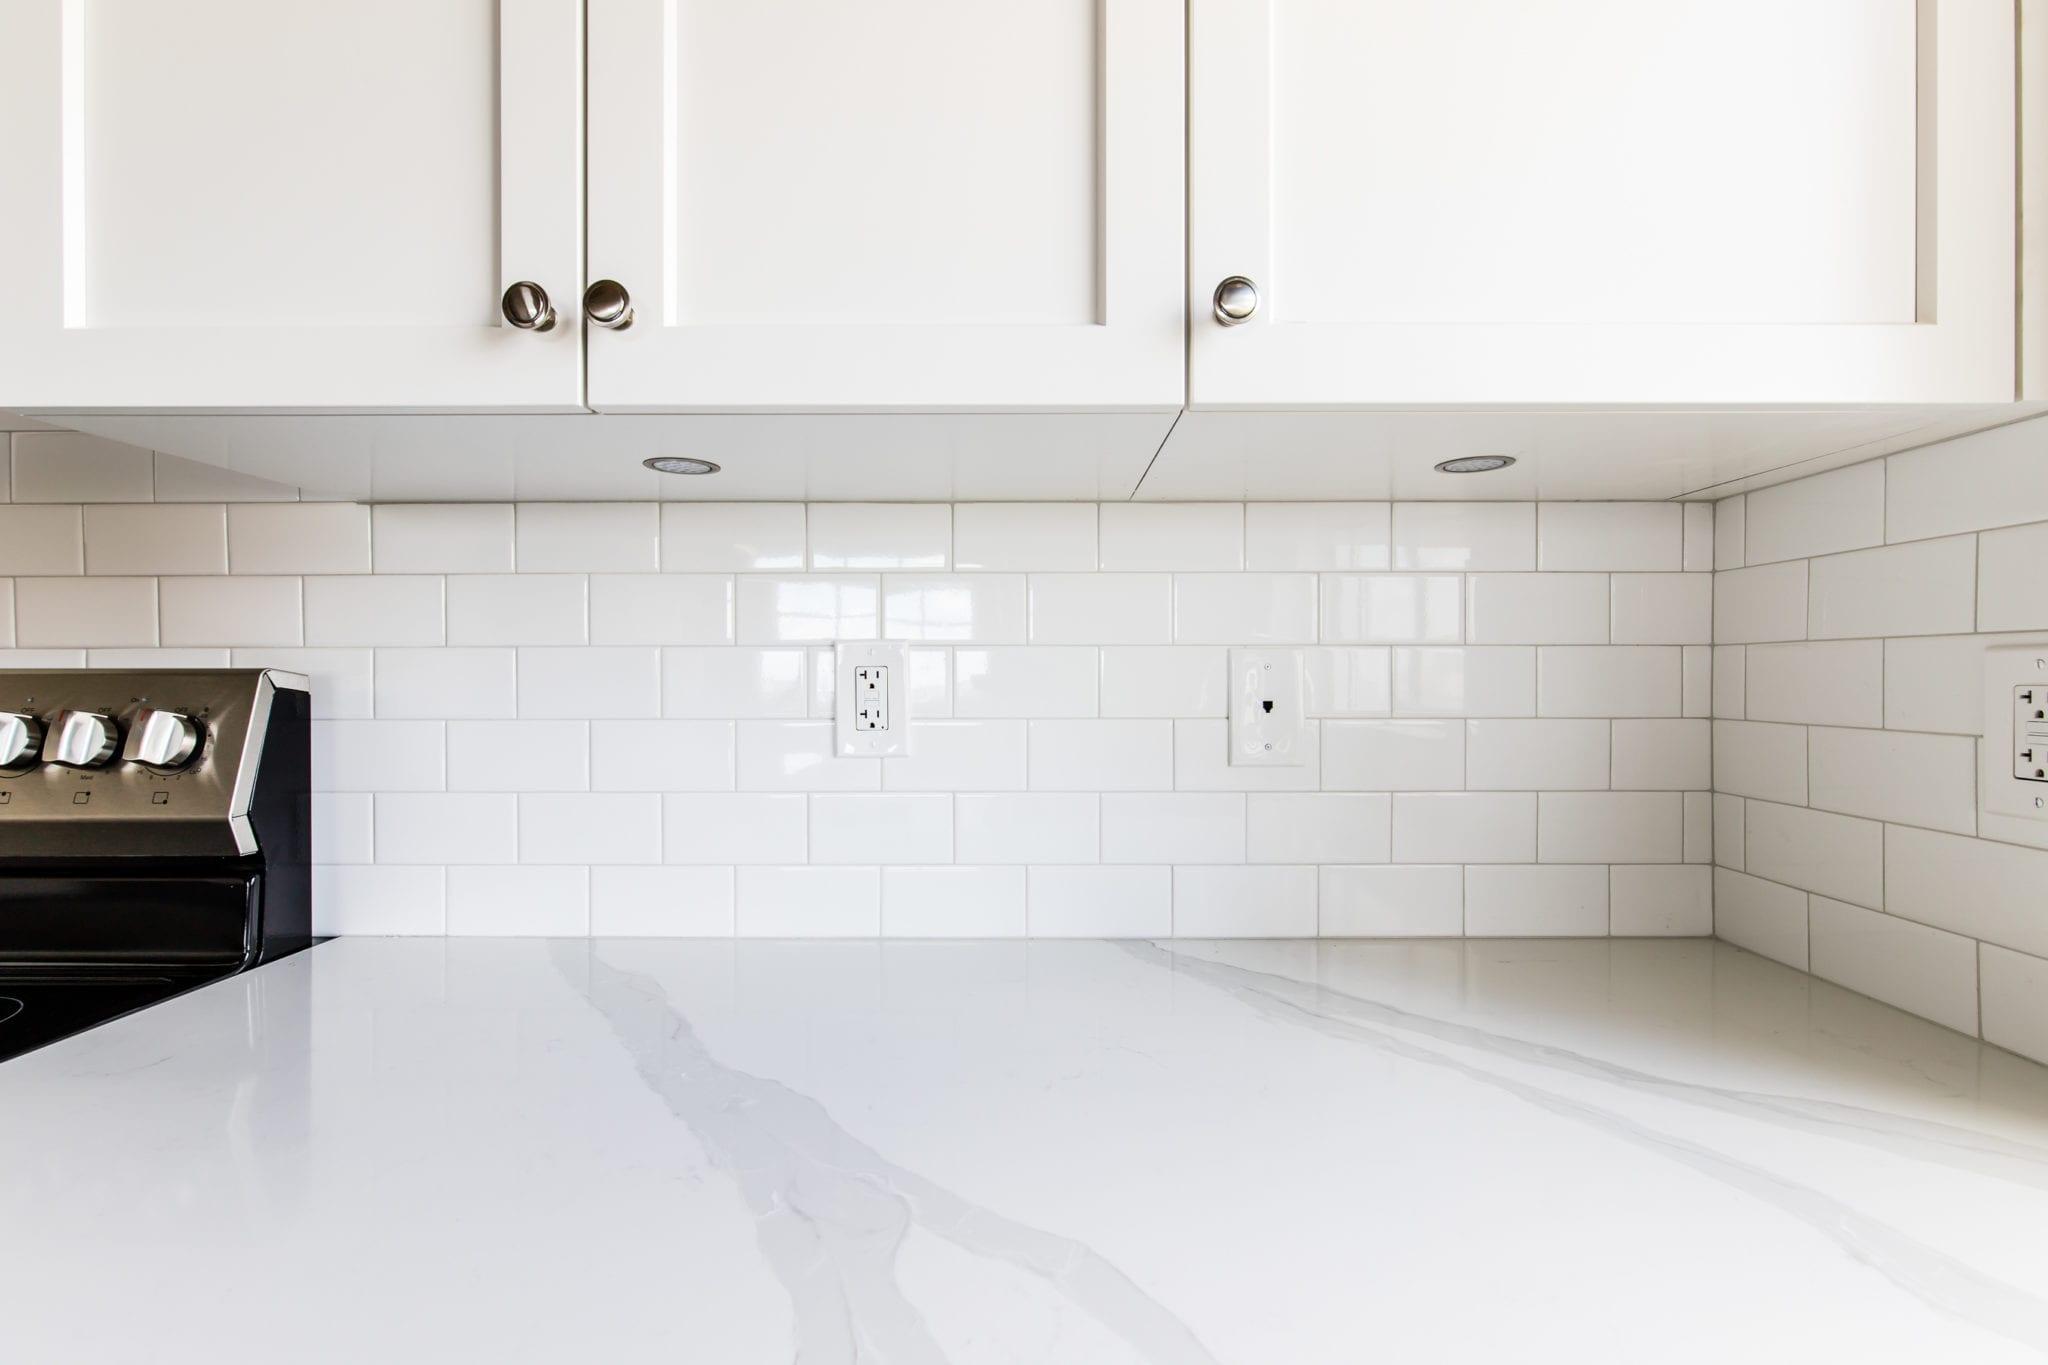 - Daltile Rittenhouse Square Artic White Glossy Tile Backsplash In